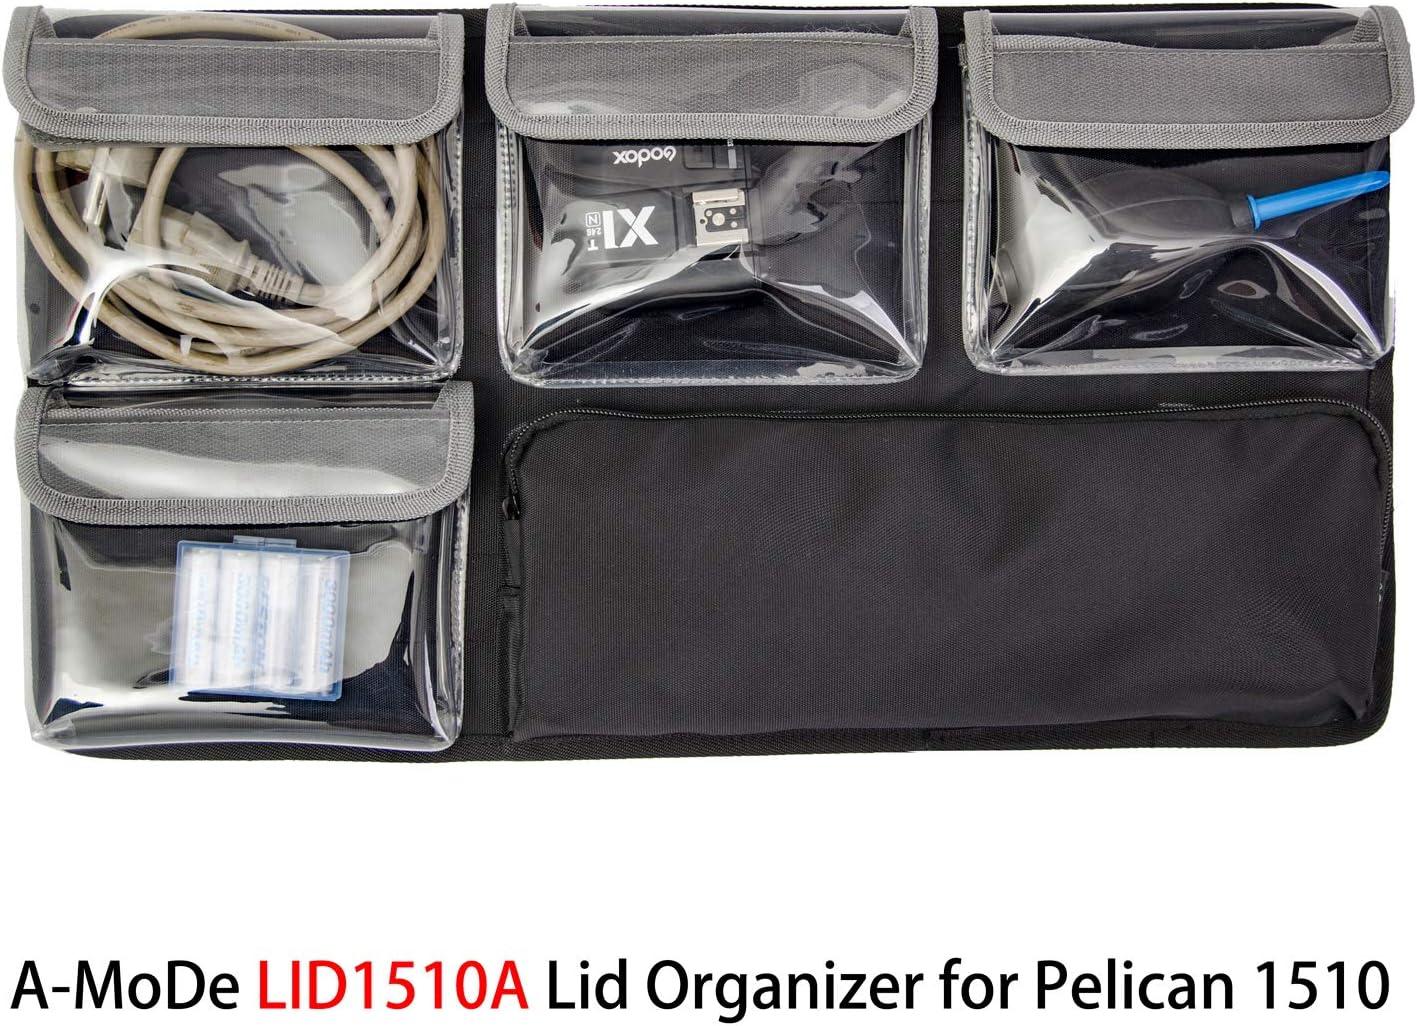 A-Mode iN1510 - Separadores Acolchados + Organizador de Tapa LID1510A para Pelican 1510 (sin Funda): Amazon.es: Electrónica